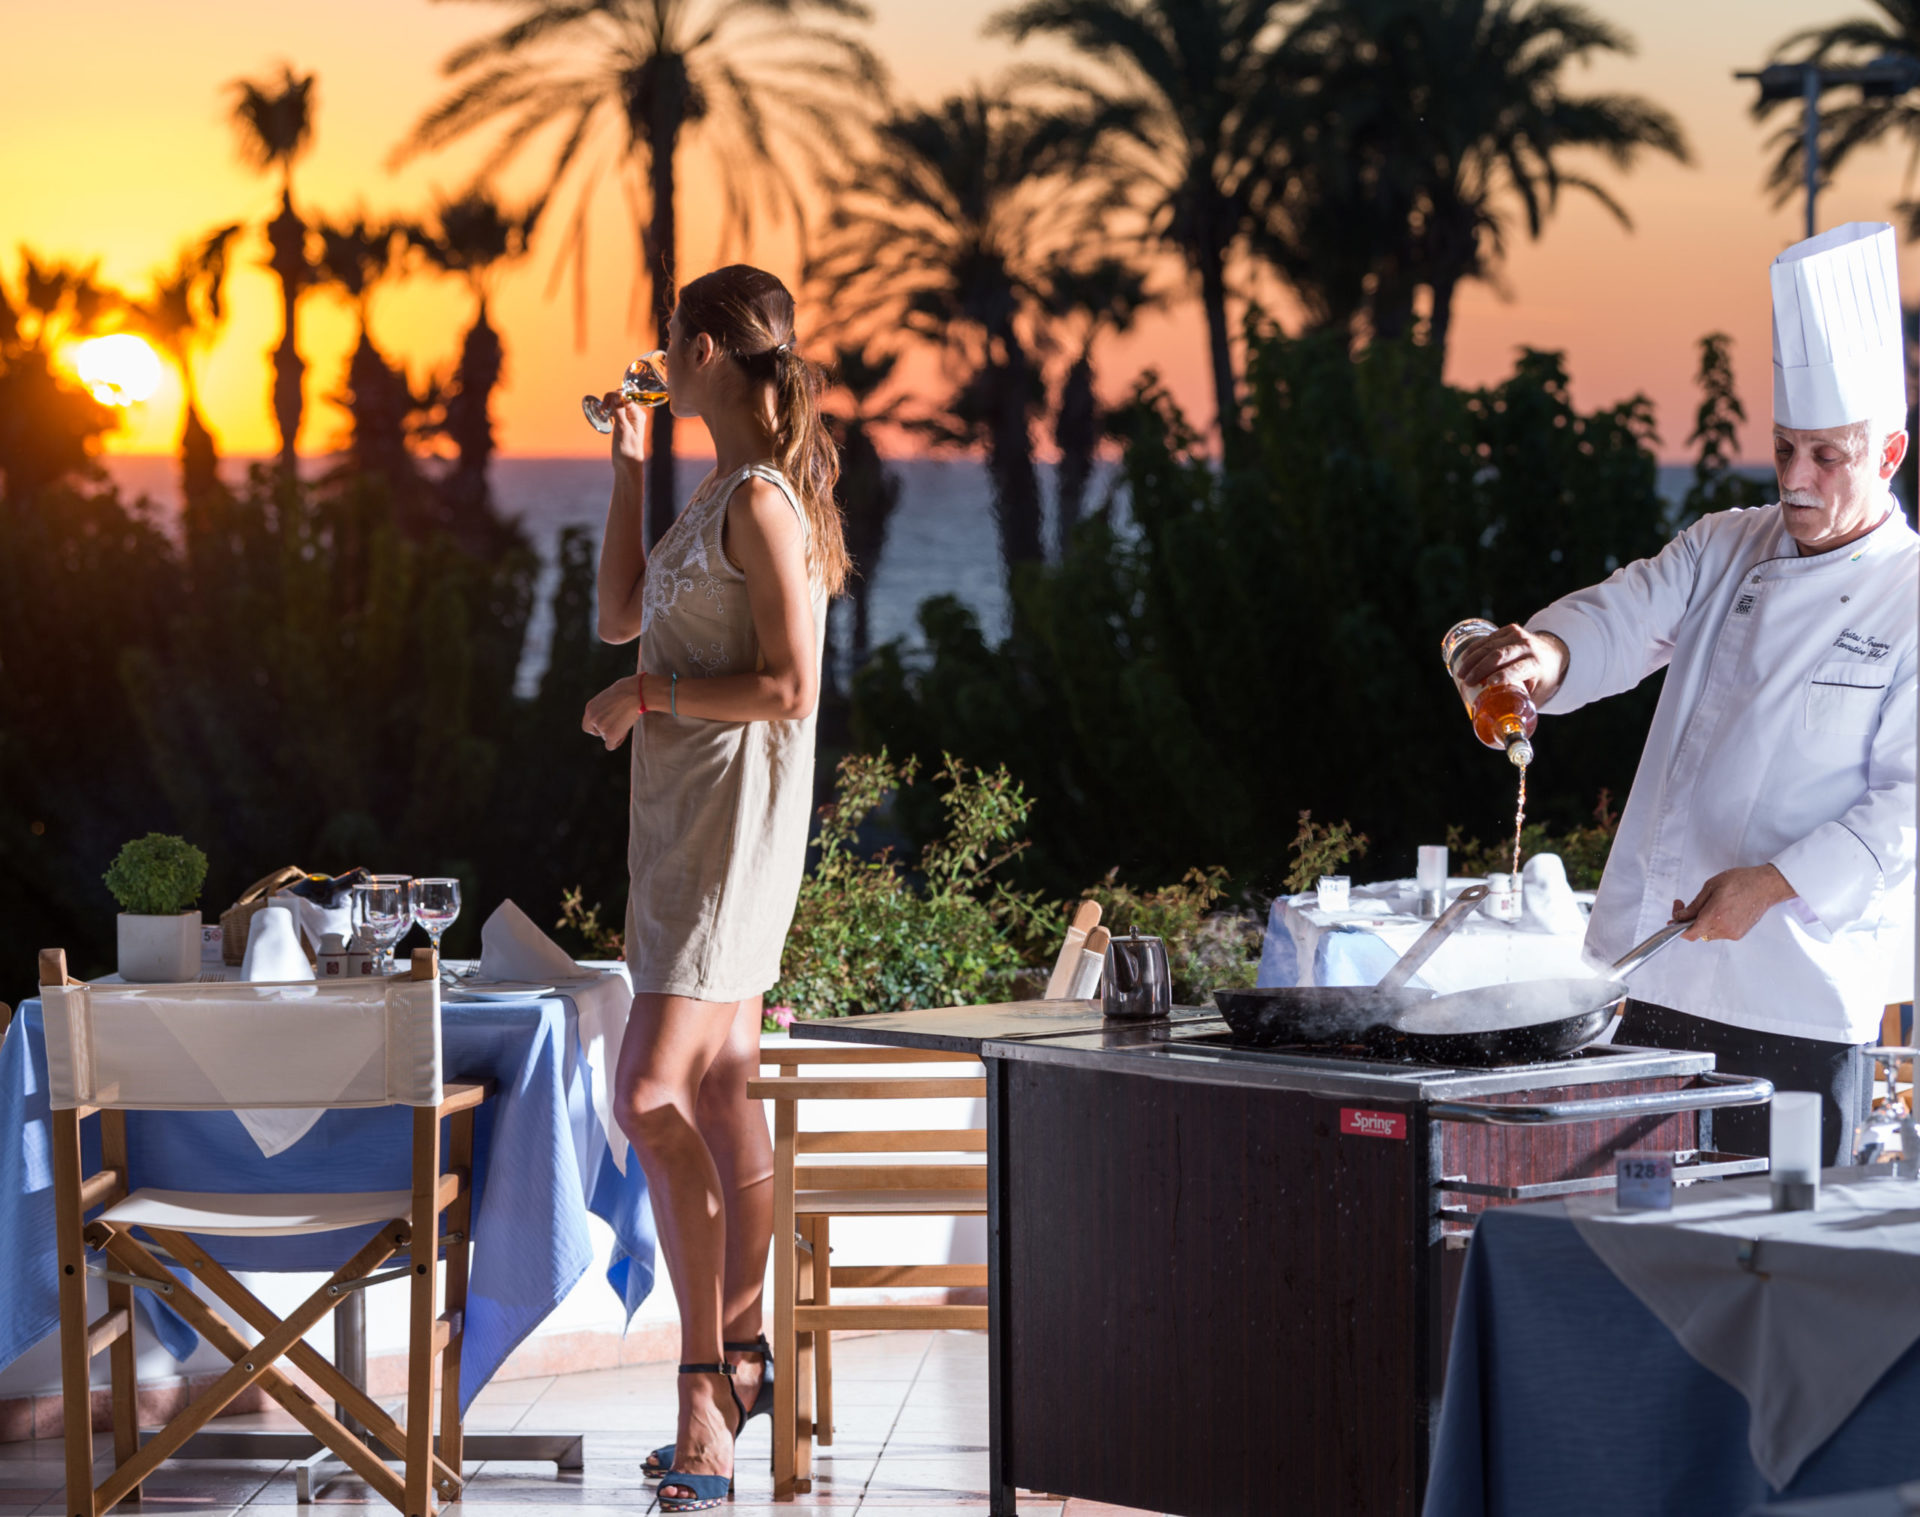 18 ATHENA ROYAL BEACH HOTEL PYGMALION RESTAURANT- FLAMBE